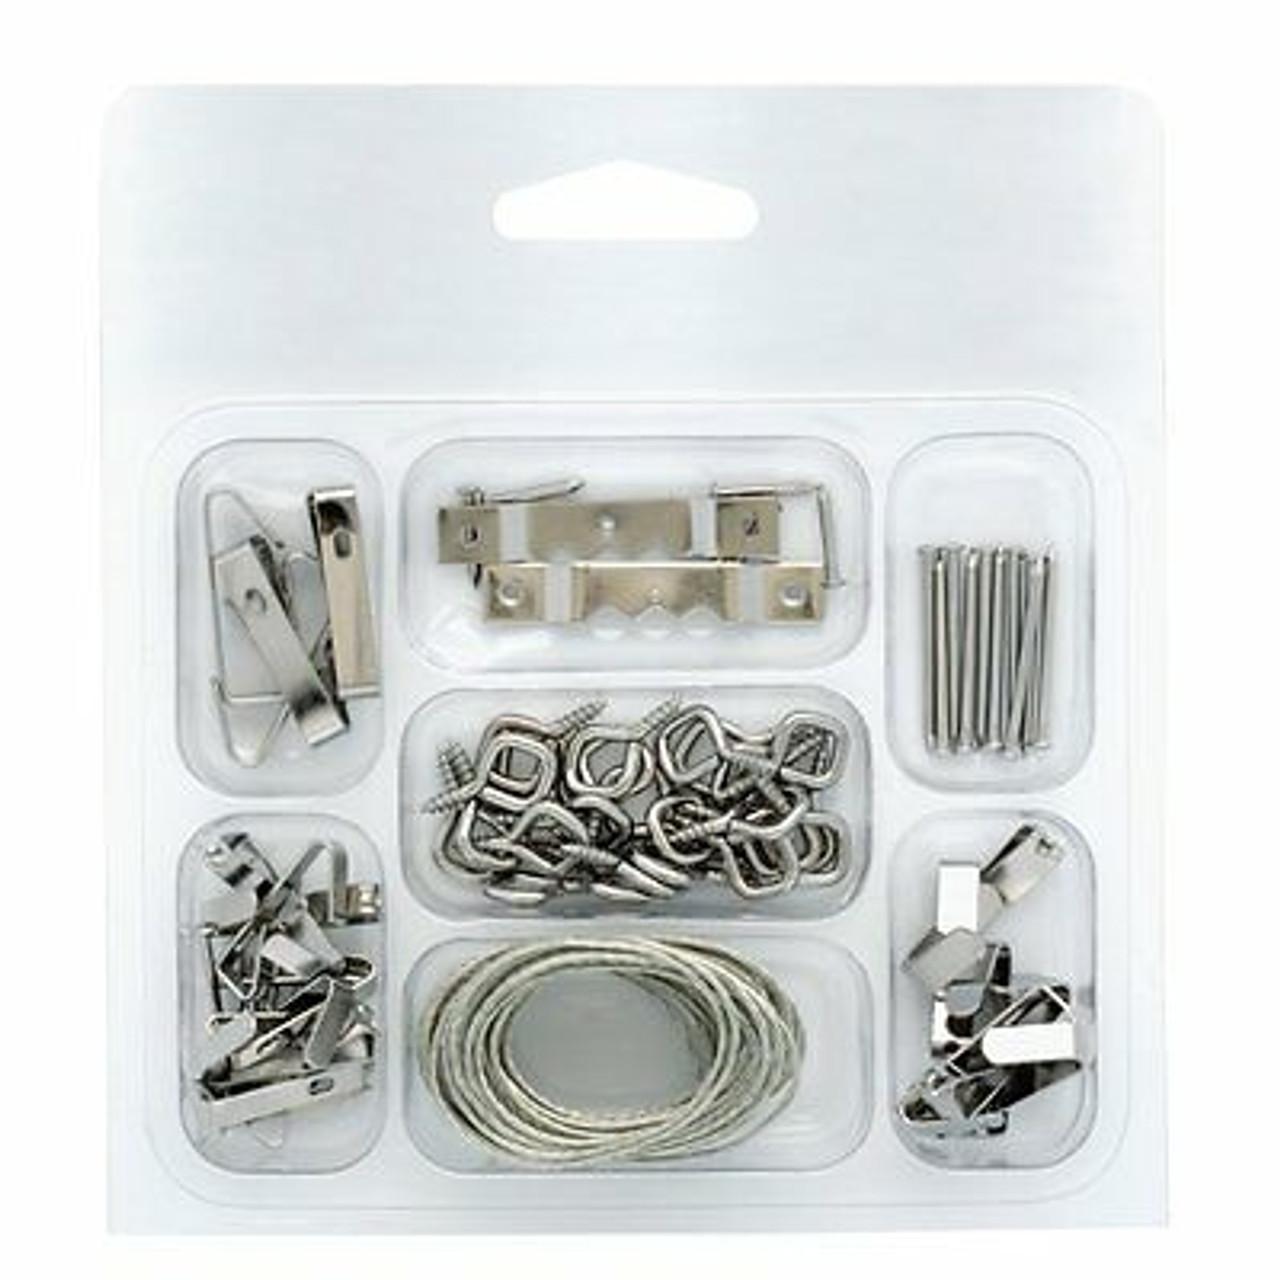 Project Basics 149149 46 Piece Light & Medium Duty Picture Hanger Kit